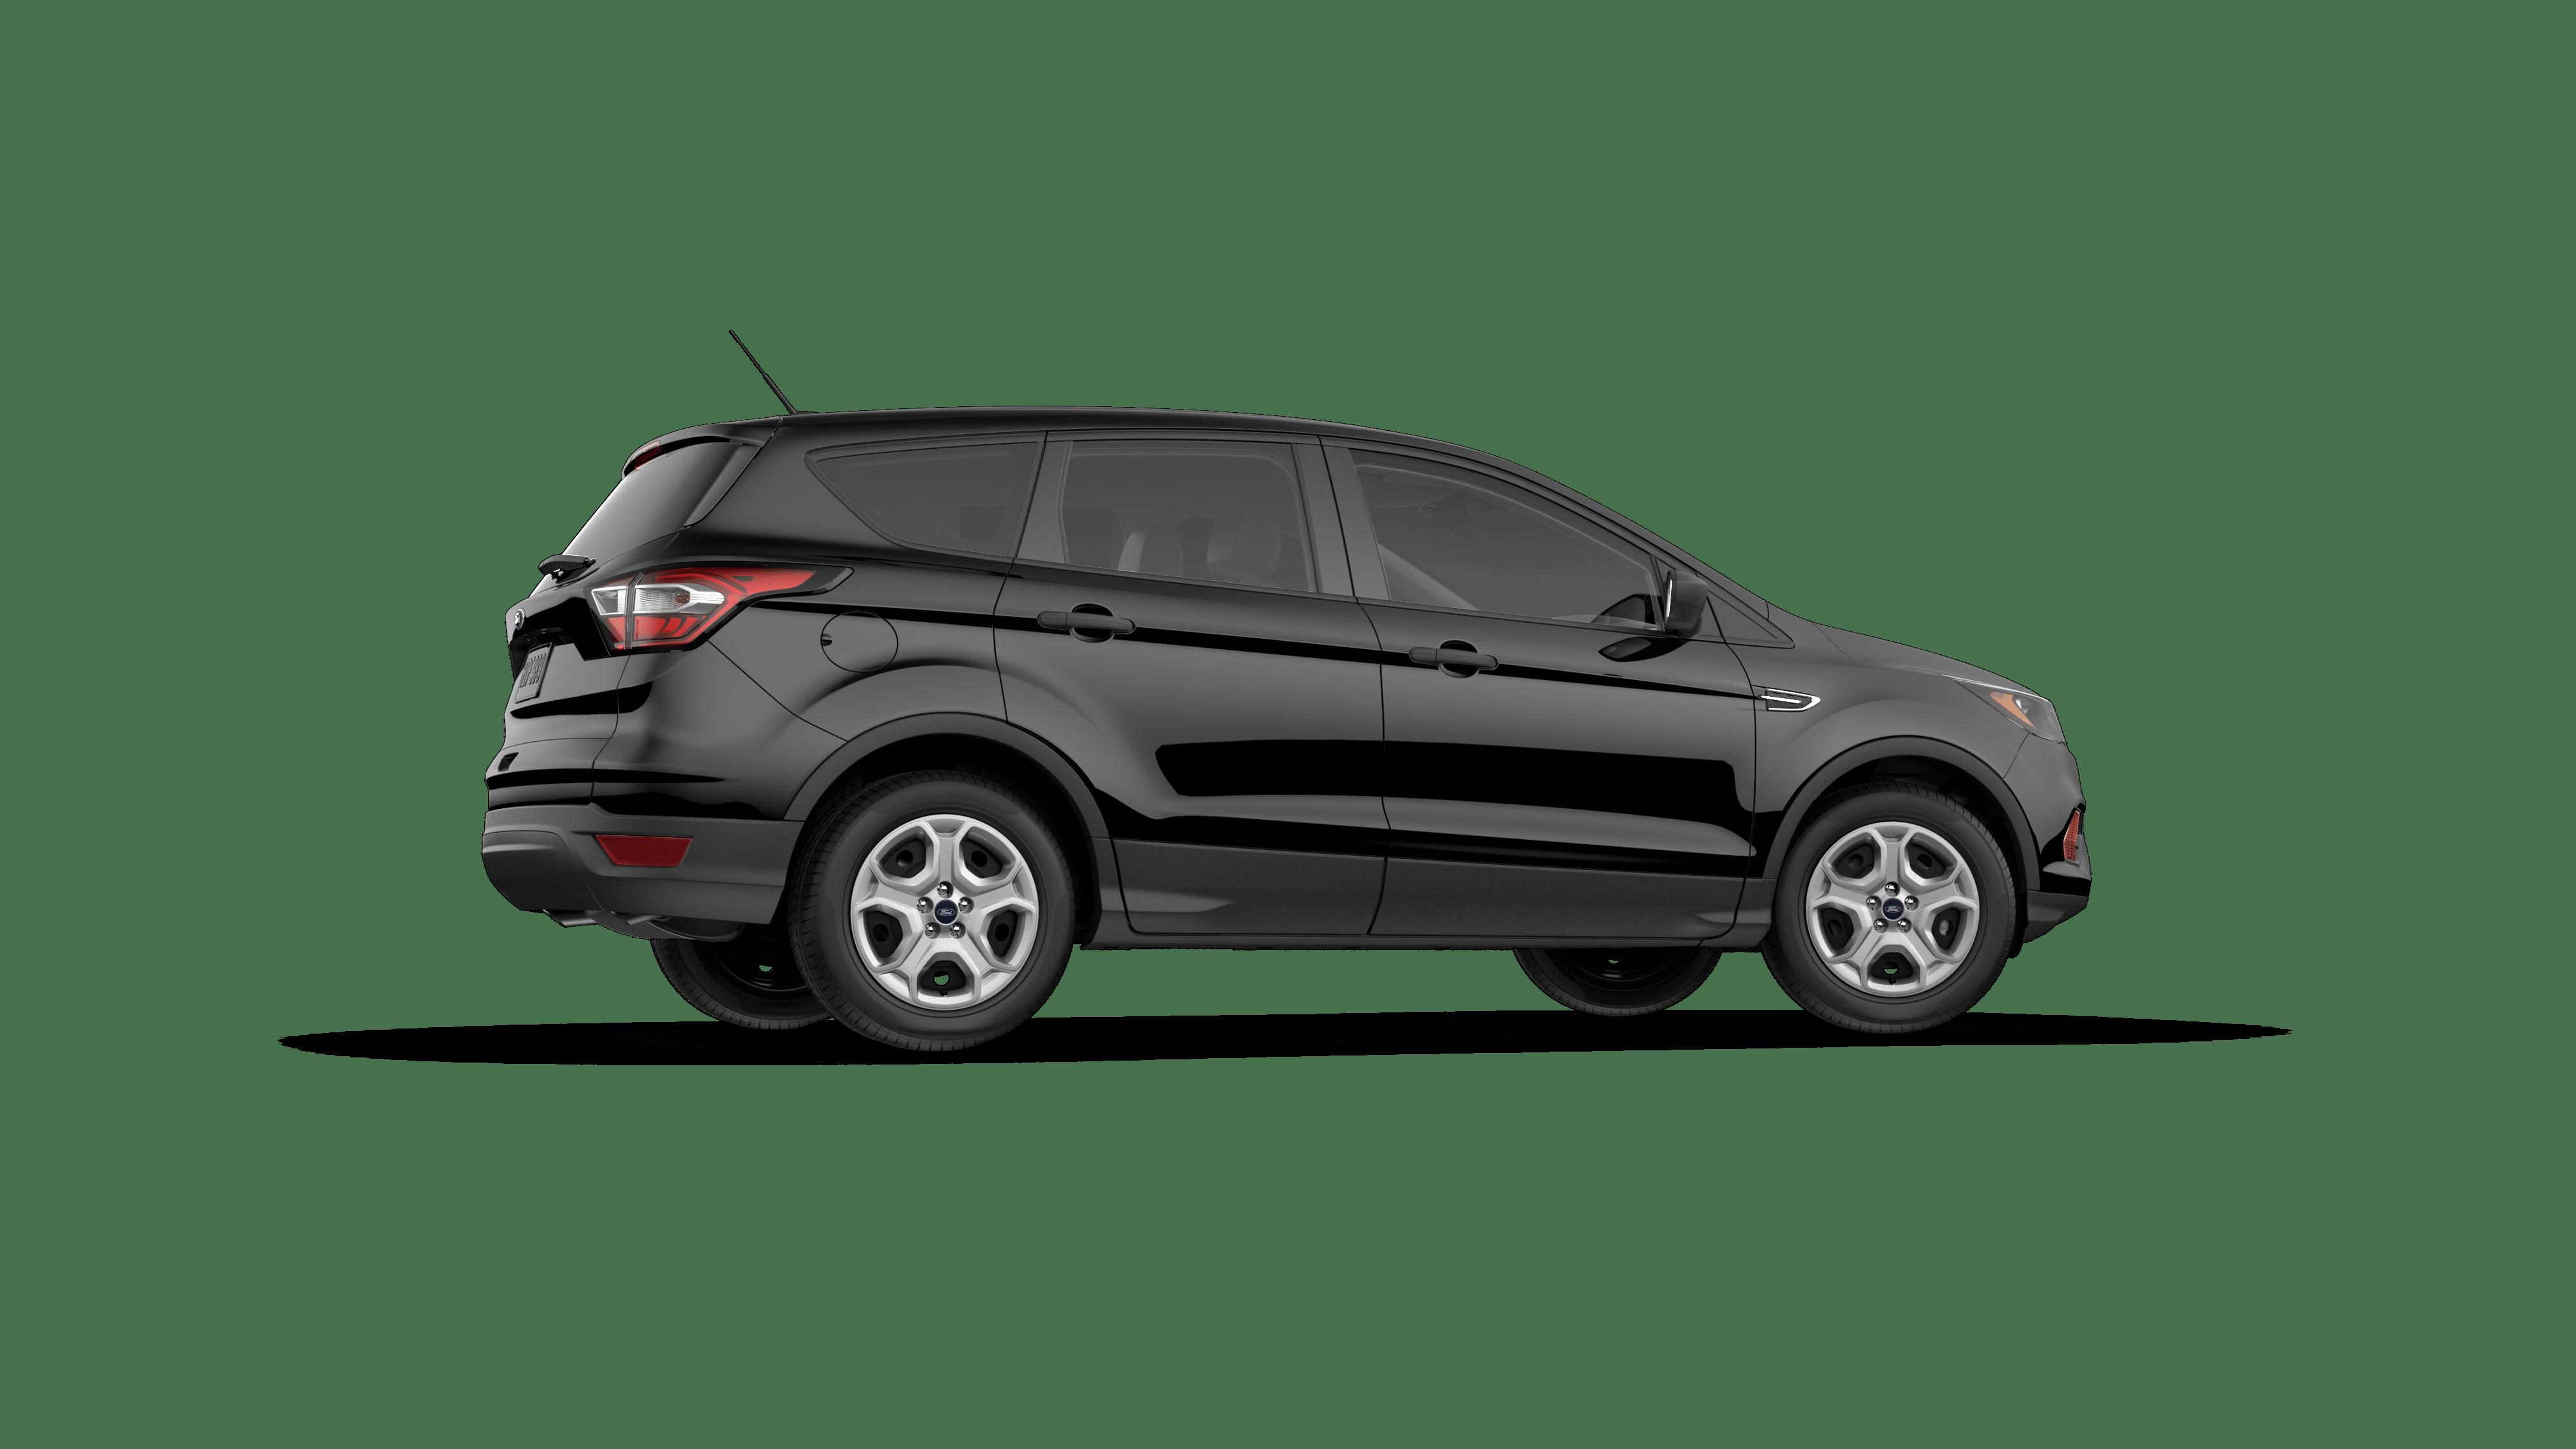 2018 ford escape for sale in fort pierce 1fmcu0f73jub55475 sunrise ford. Black Bedroom Furniture Sets. Home Design Ideas